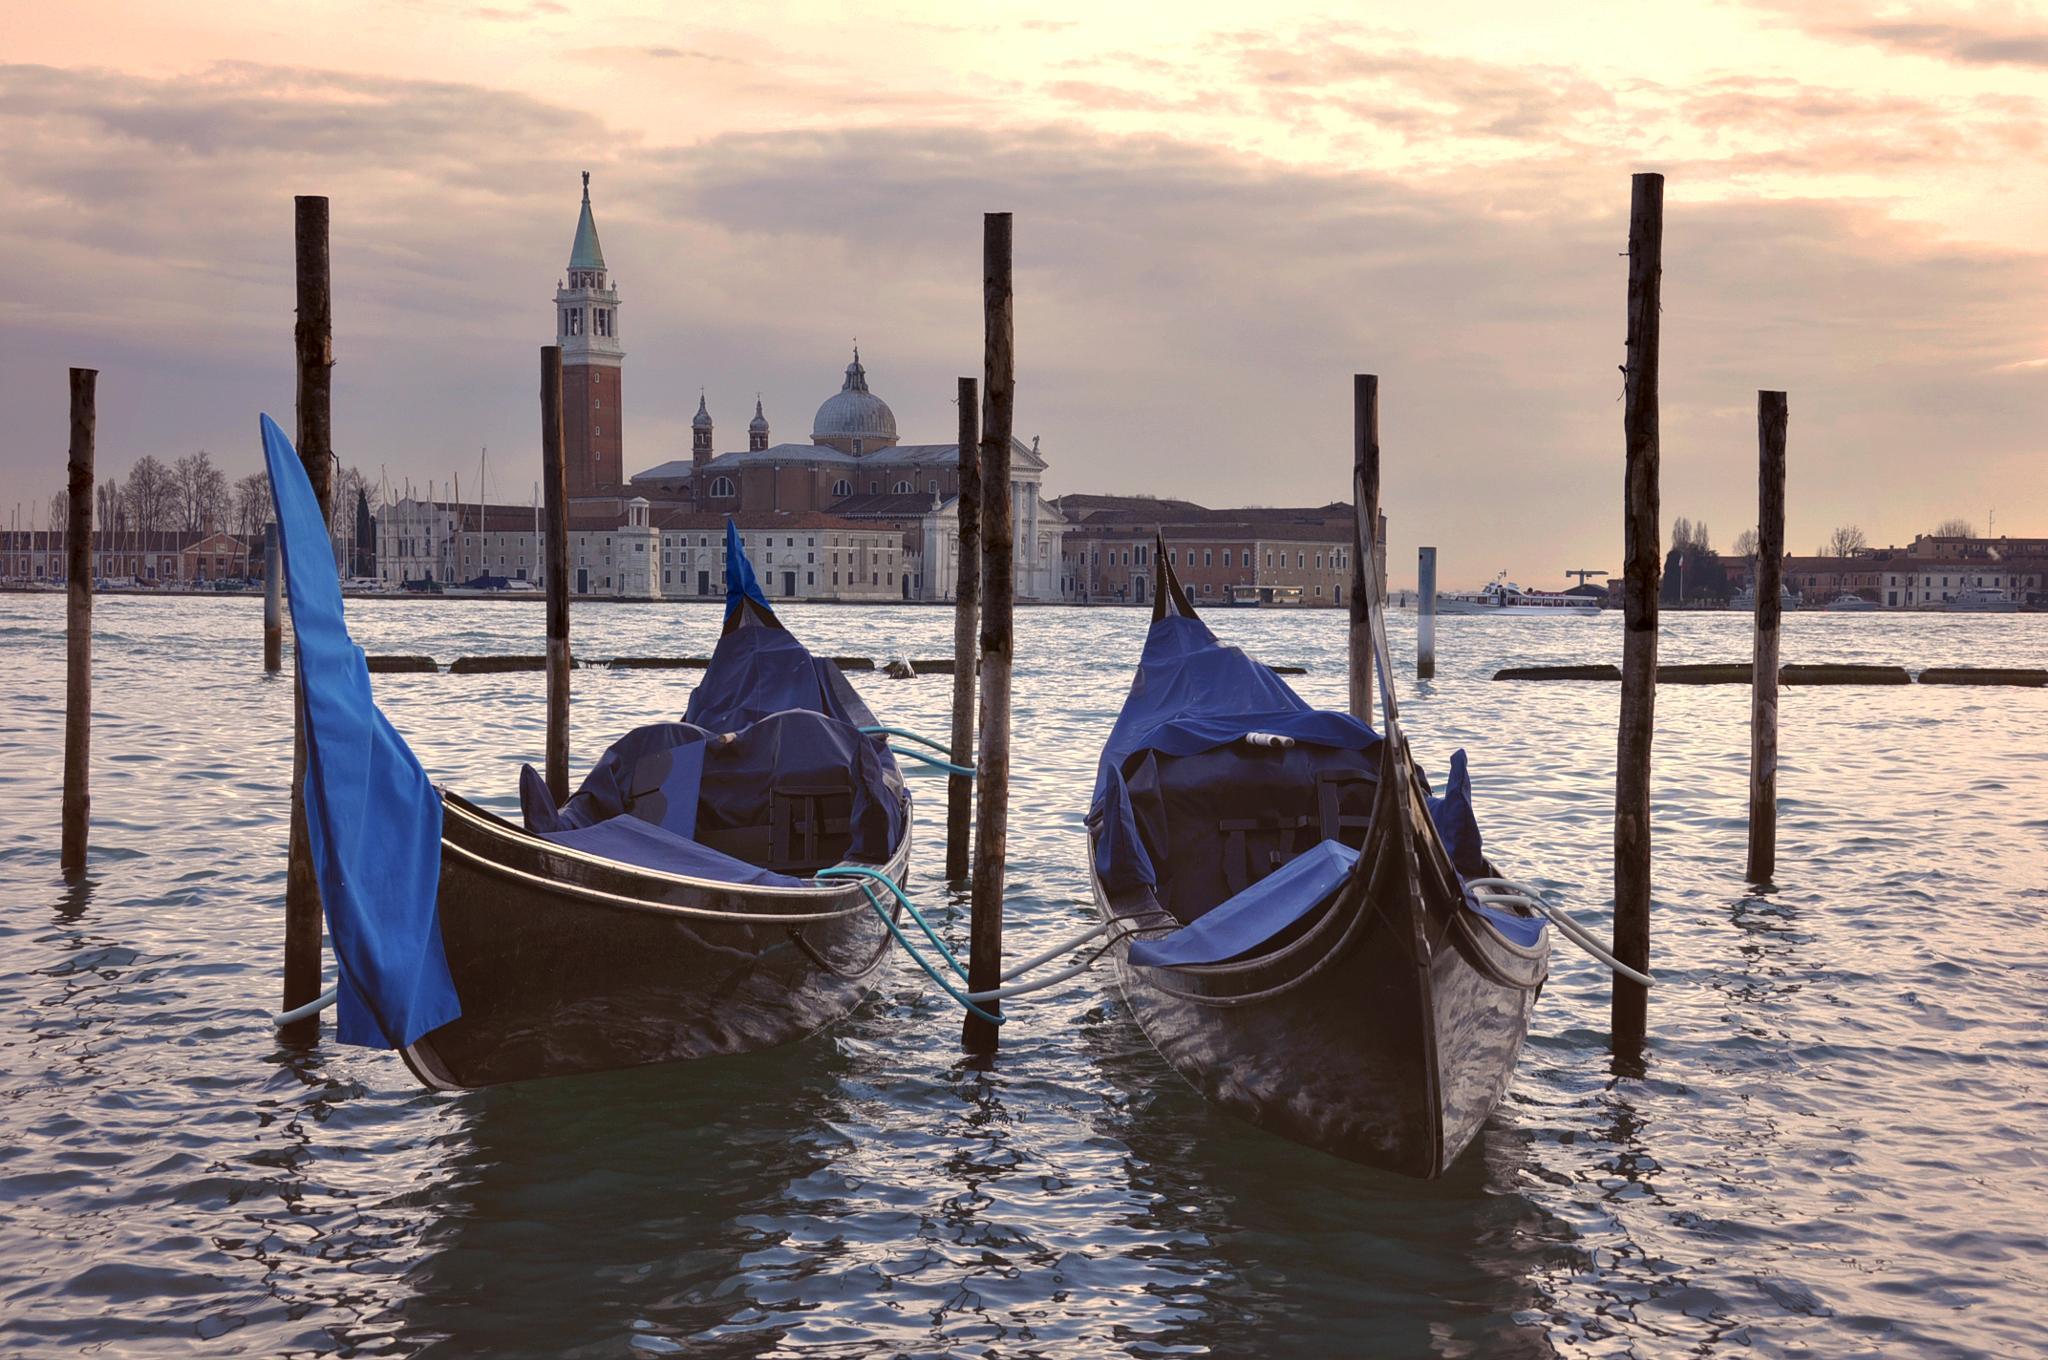 Waiting gondolas by rachelphillips100